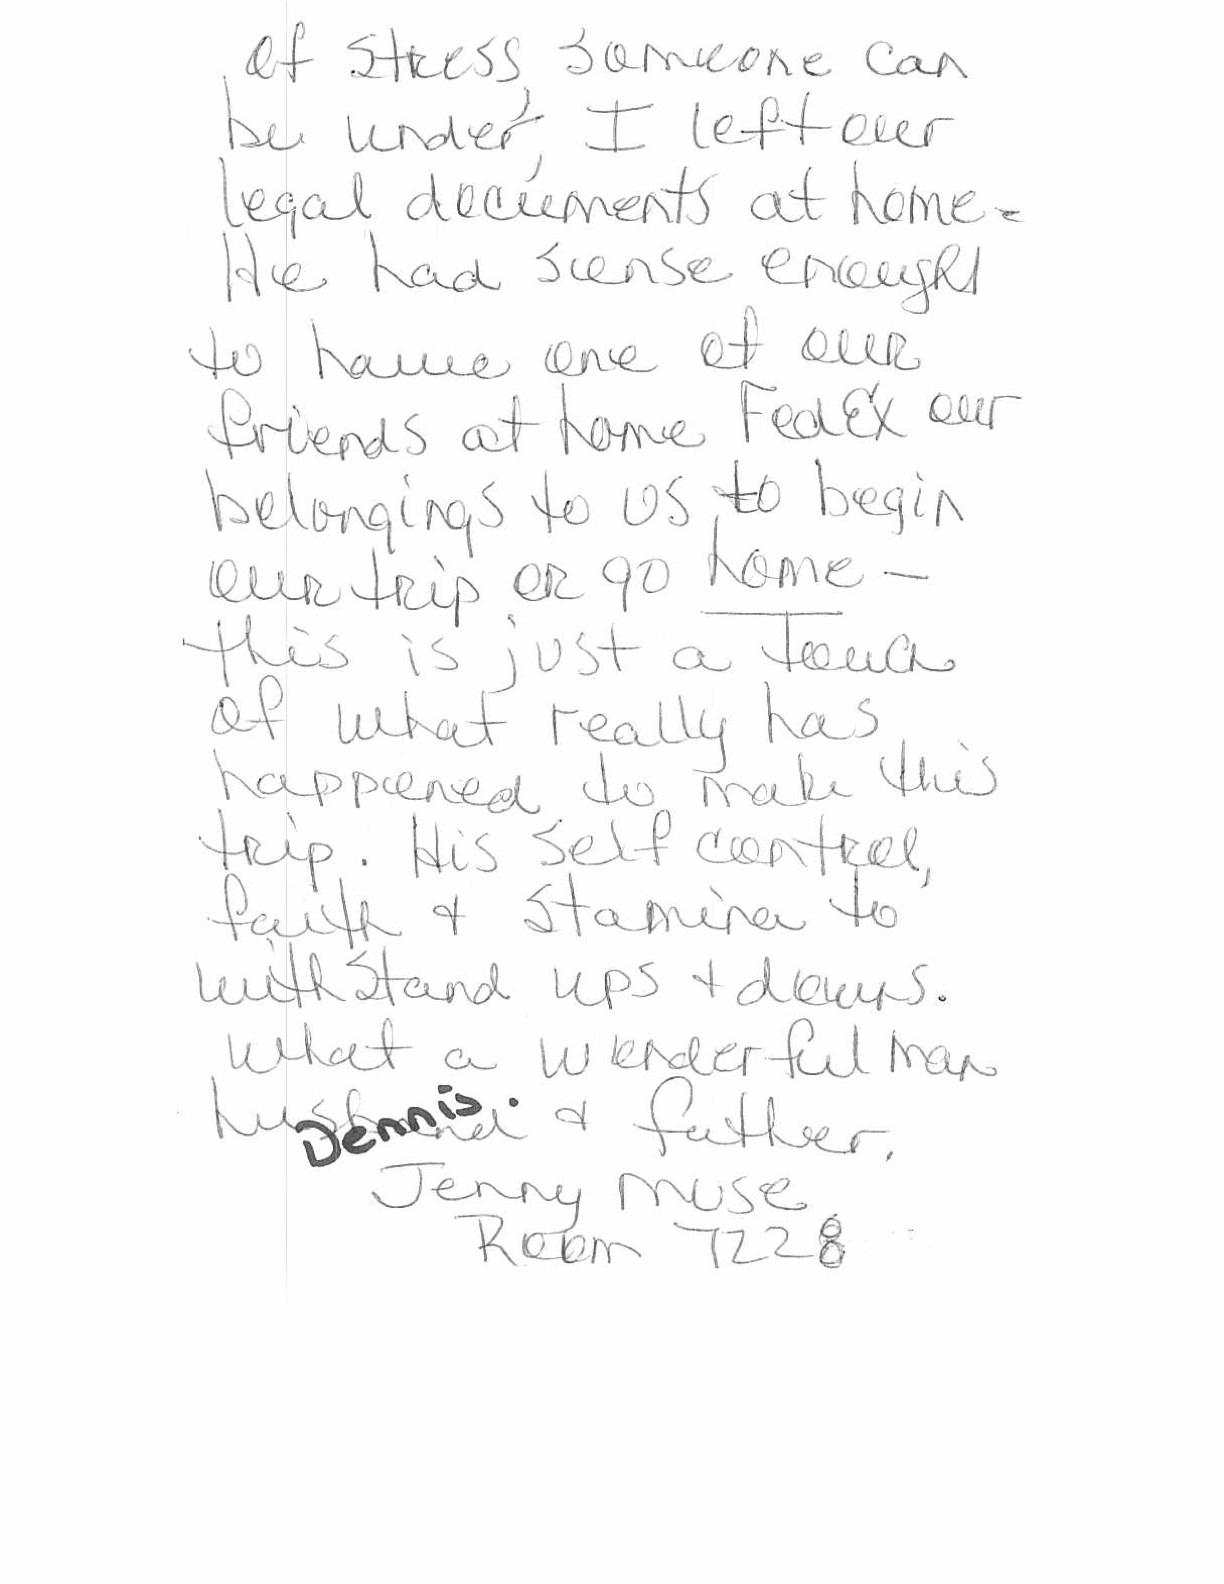 Last Letter- last page